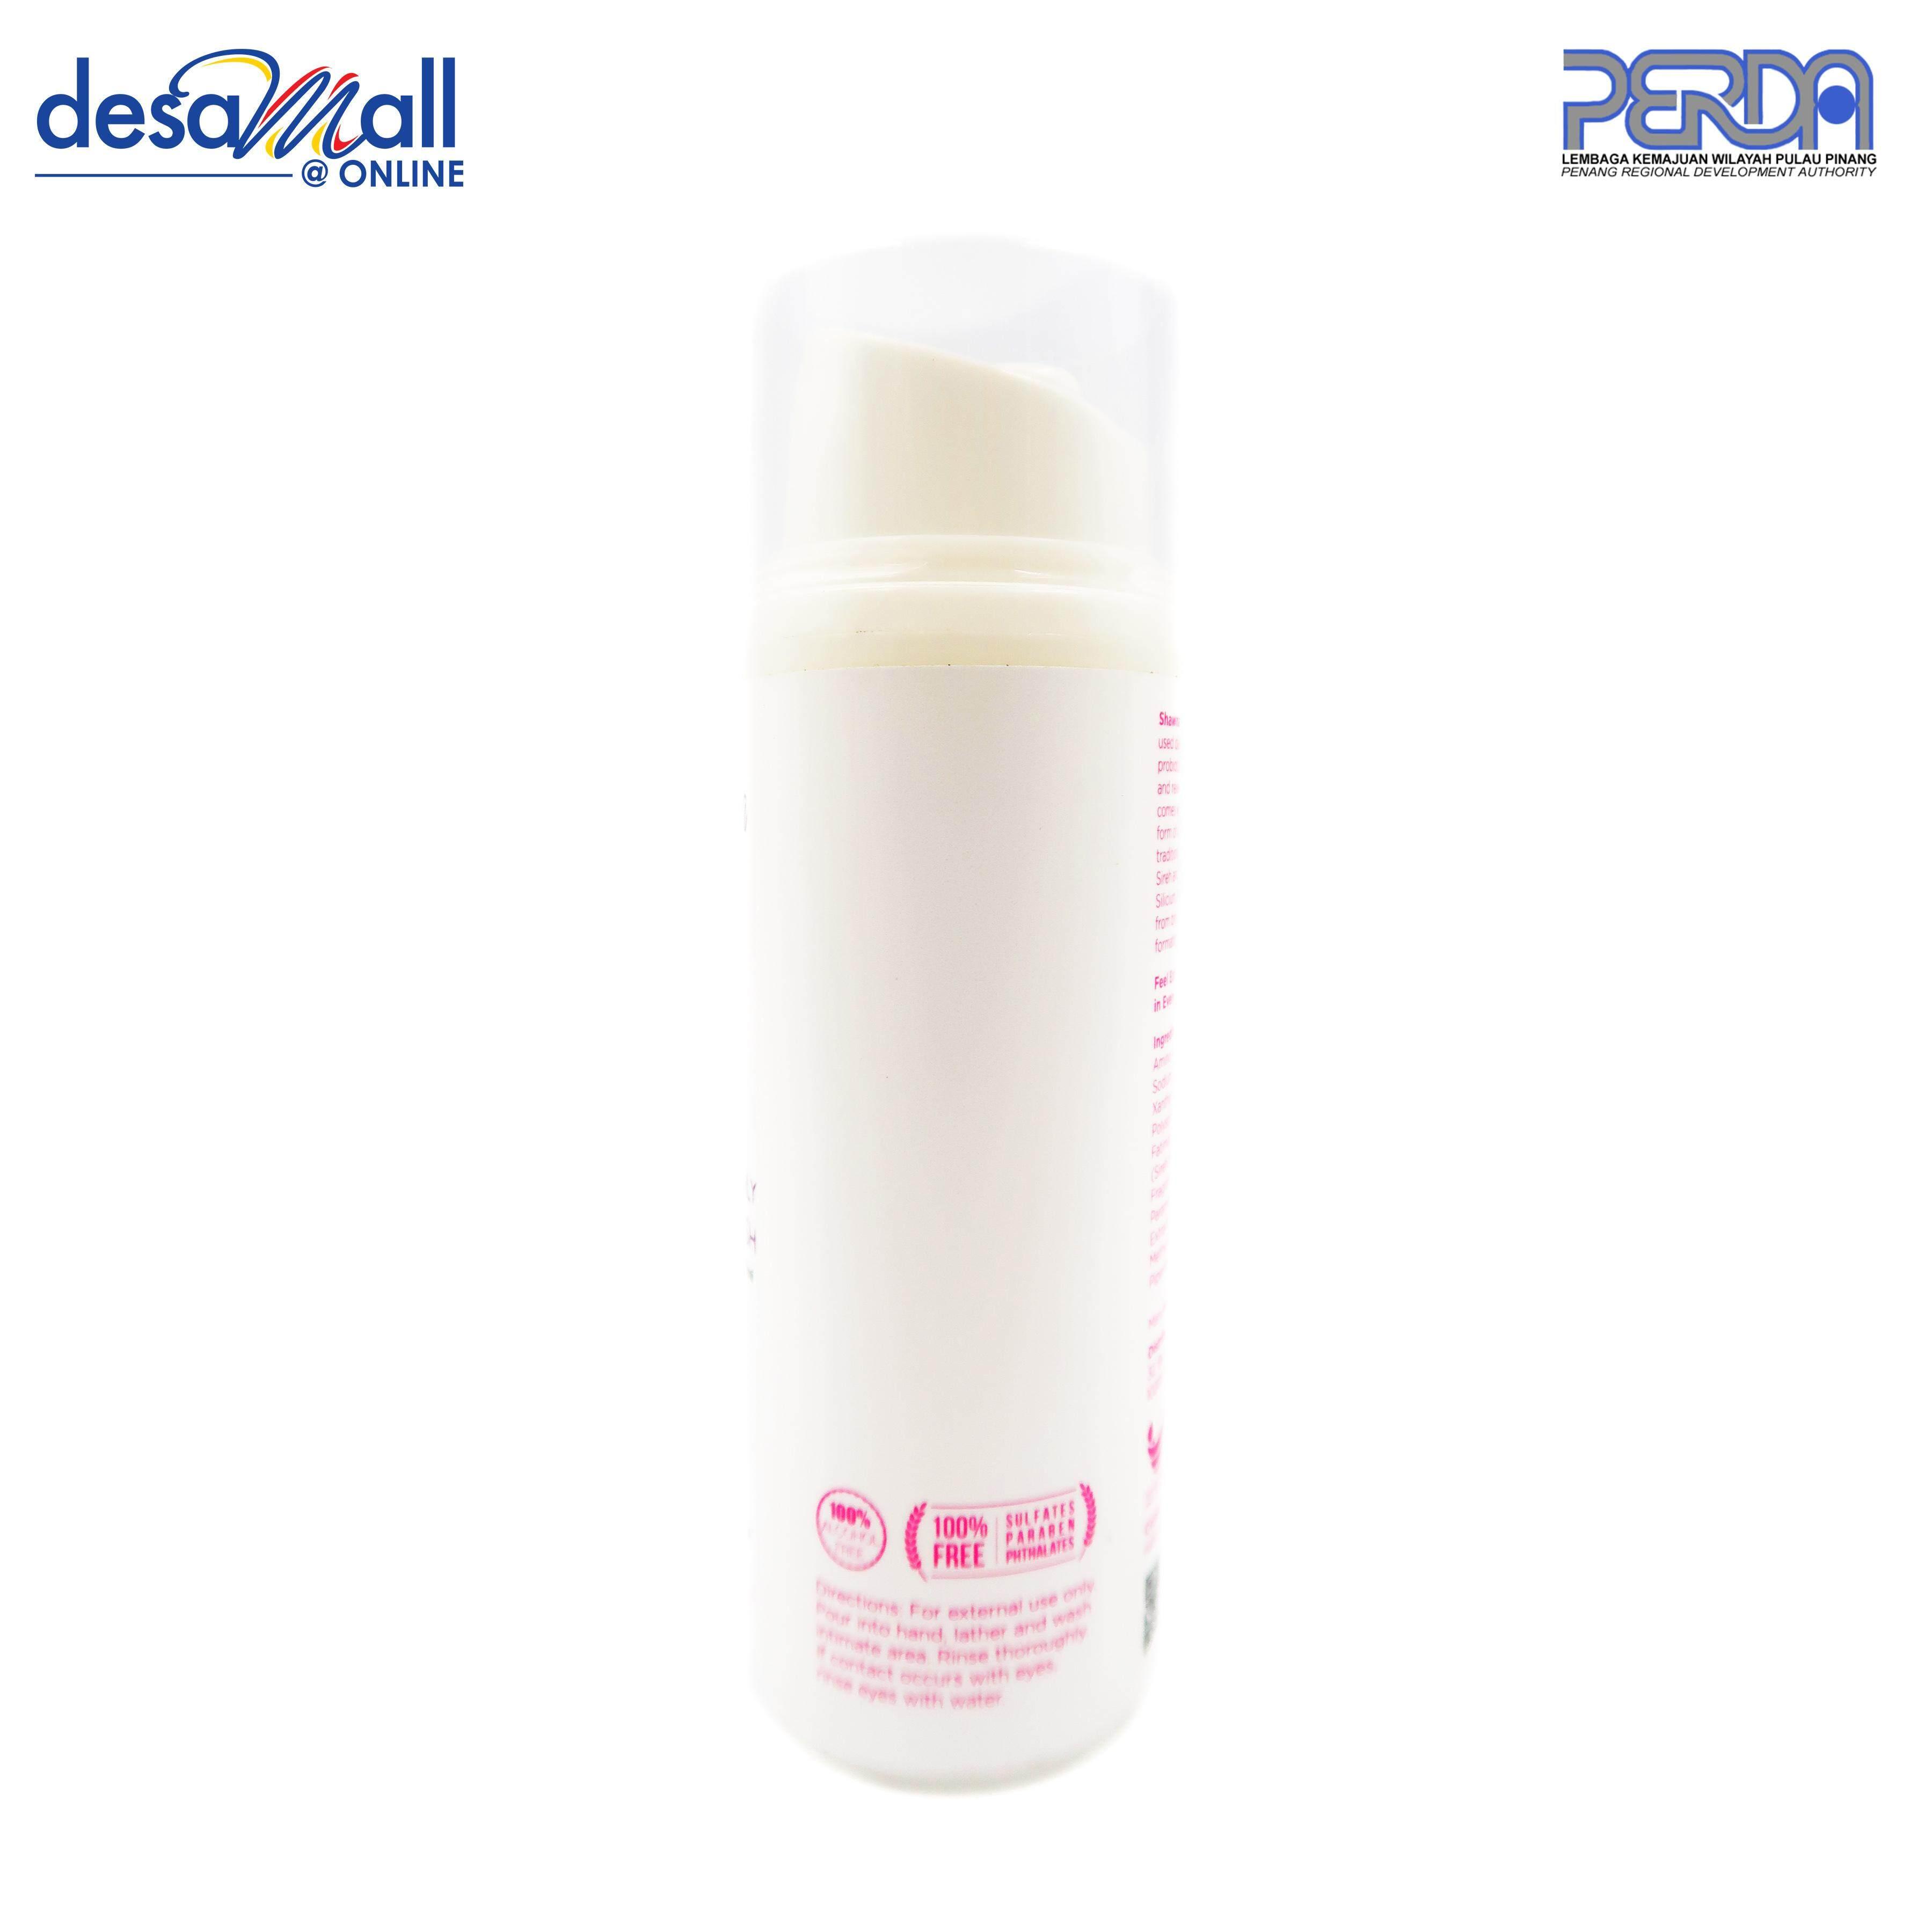 SHAWNA Anti-Aging Daily Feminine Wash 100ml